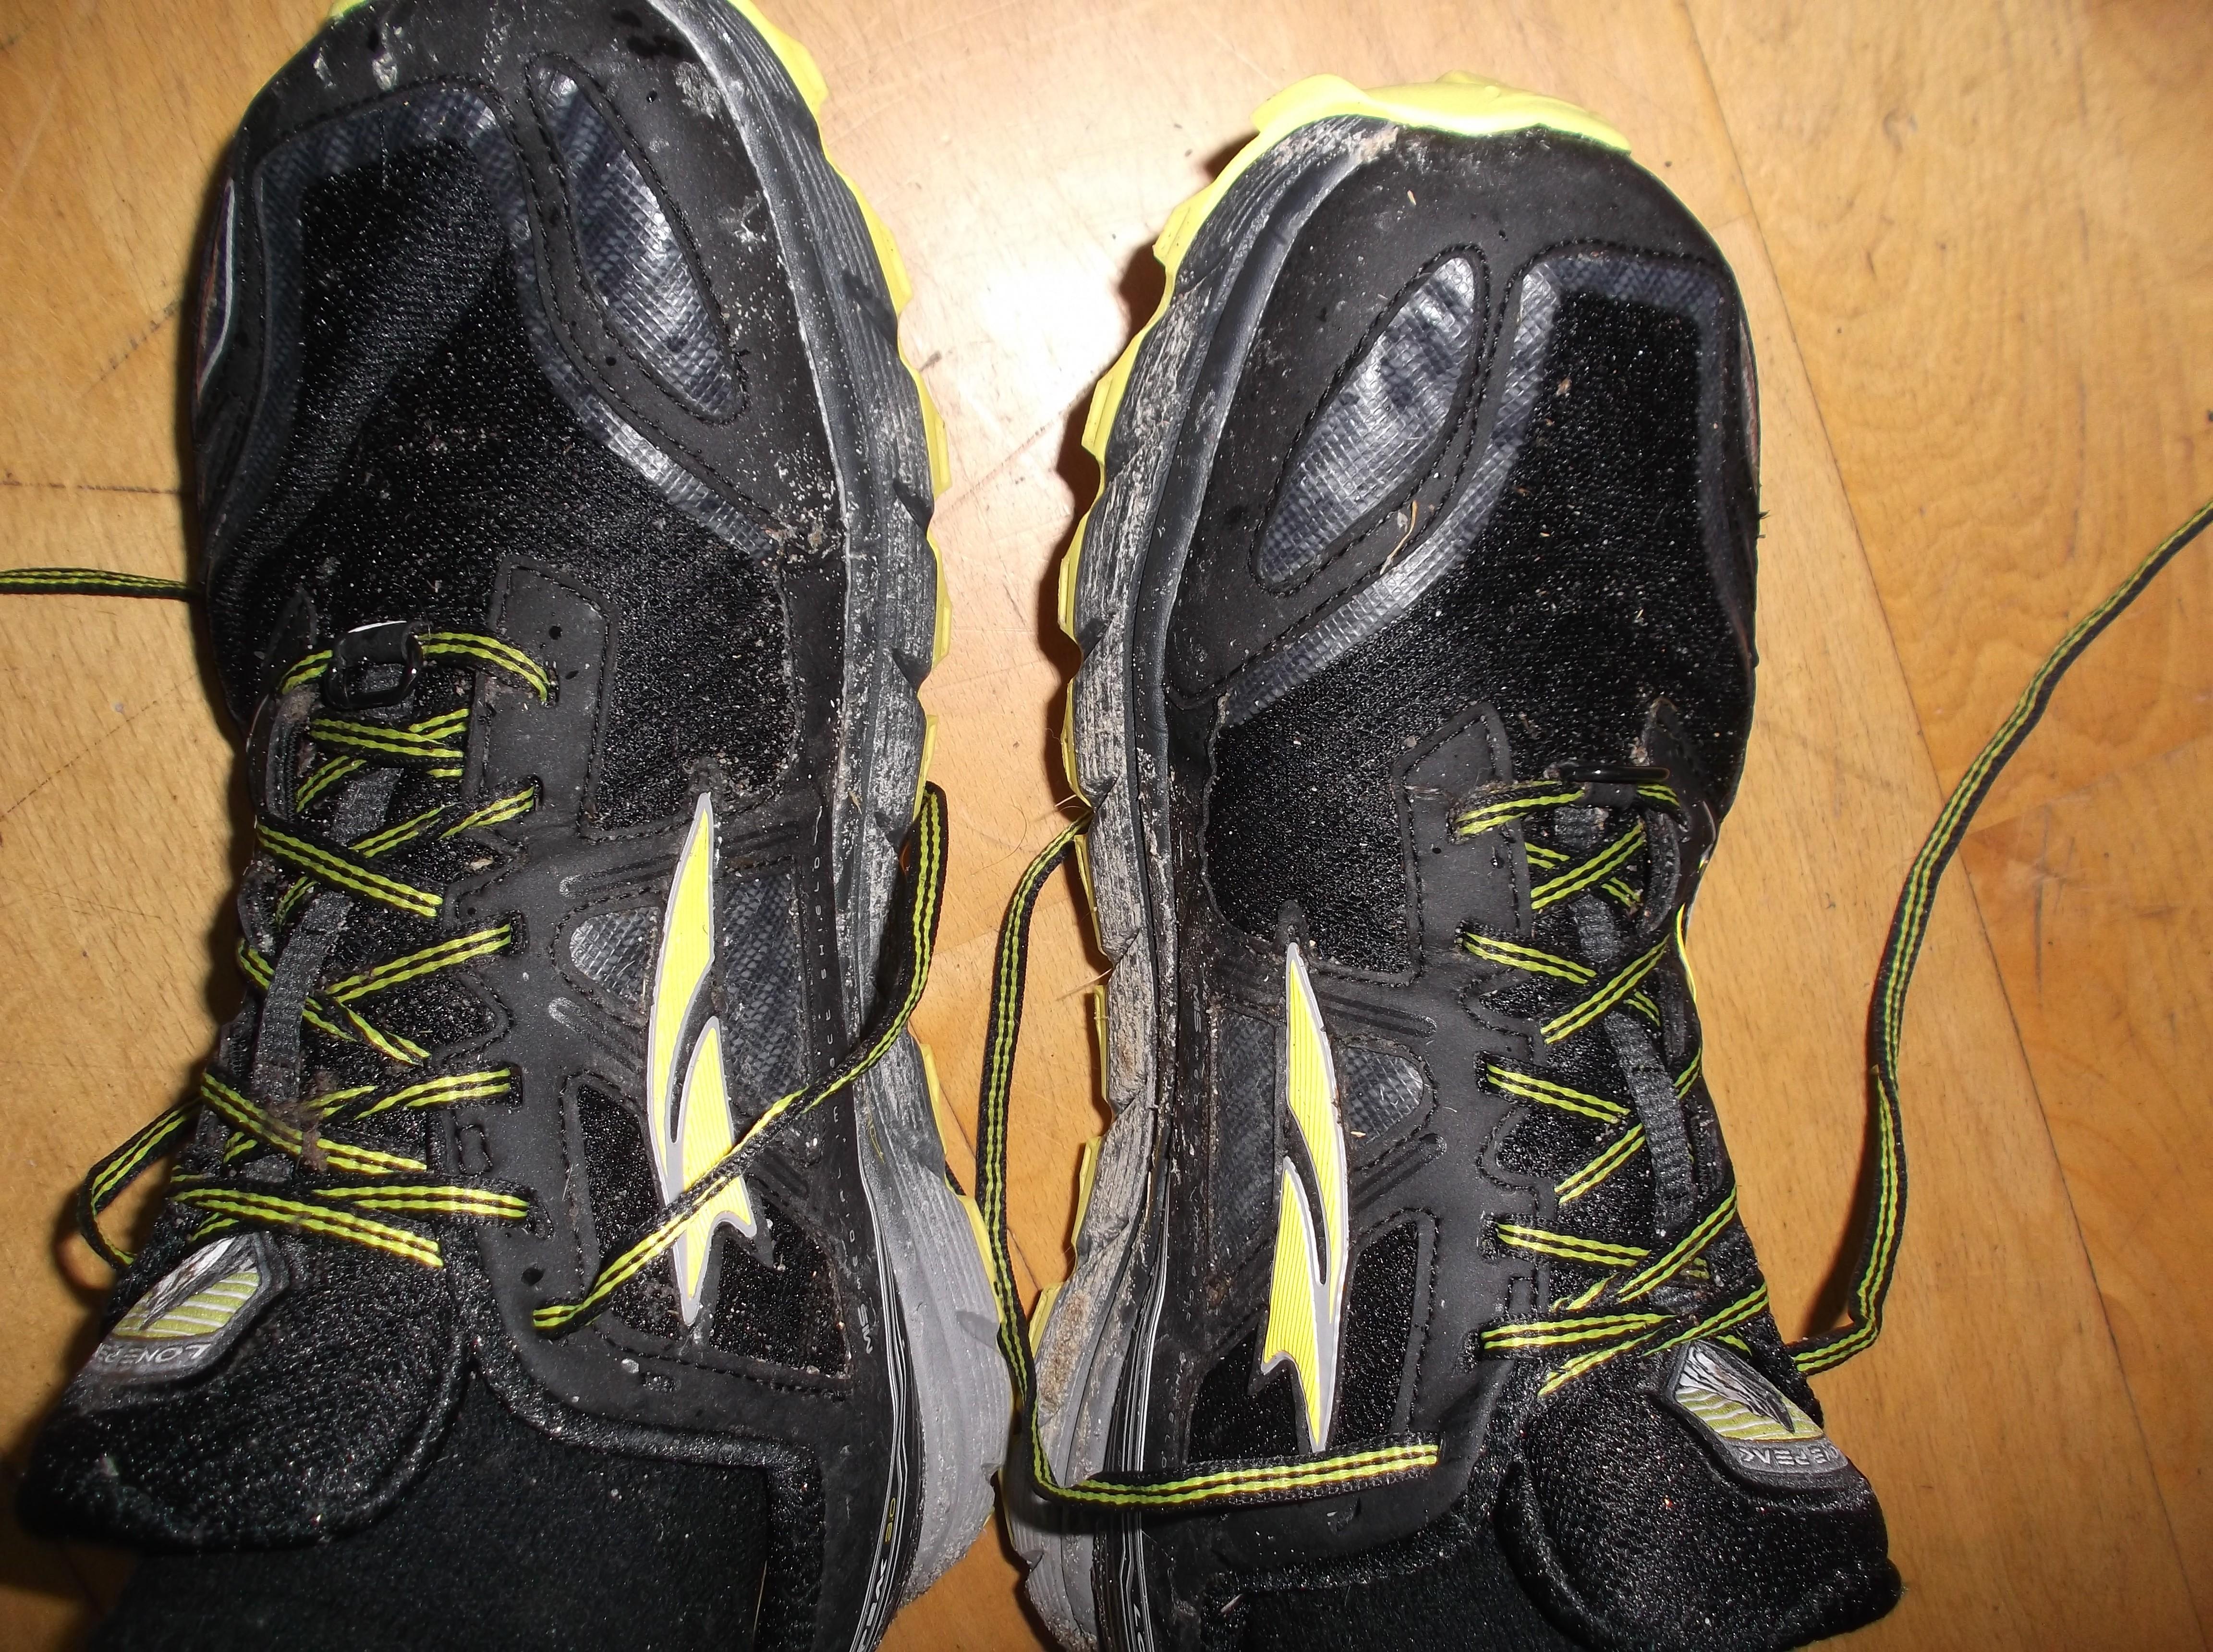 meet bdadb 27d84 Altra Lone Peak 3.0 first impressions · Conor's Bandon Blog